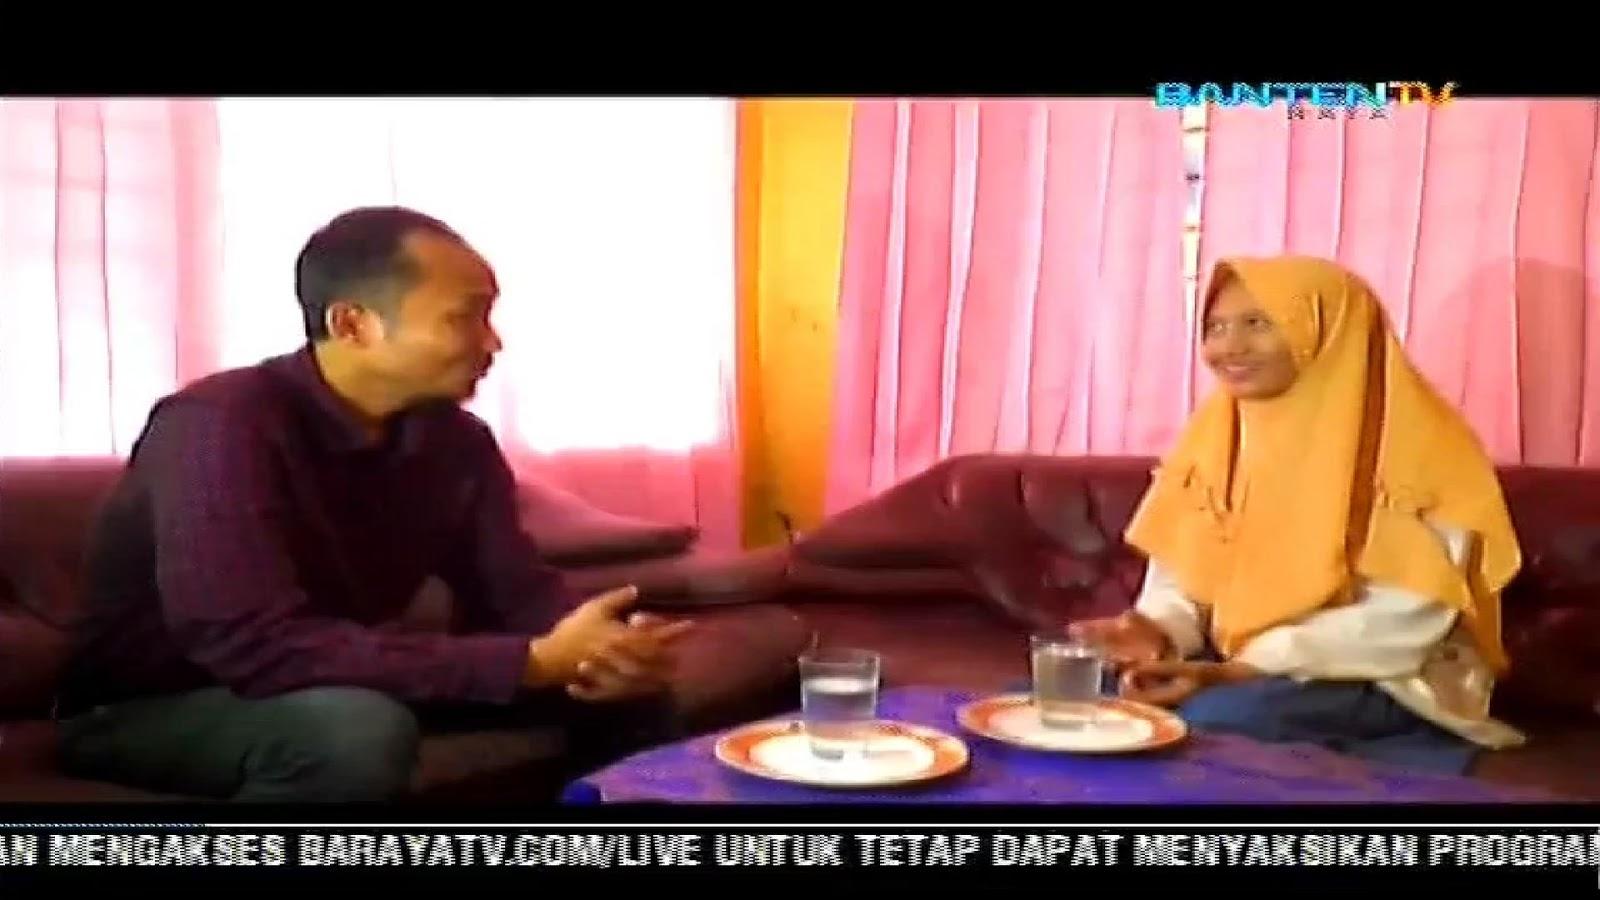 Frekuensi siaran Banten Raya TV di satelit ChinaSat 11 Terbaru